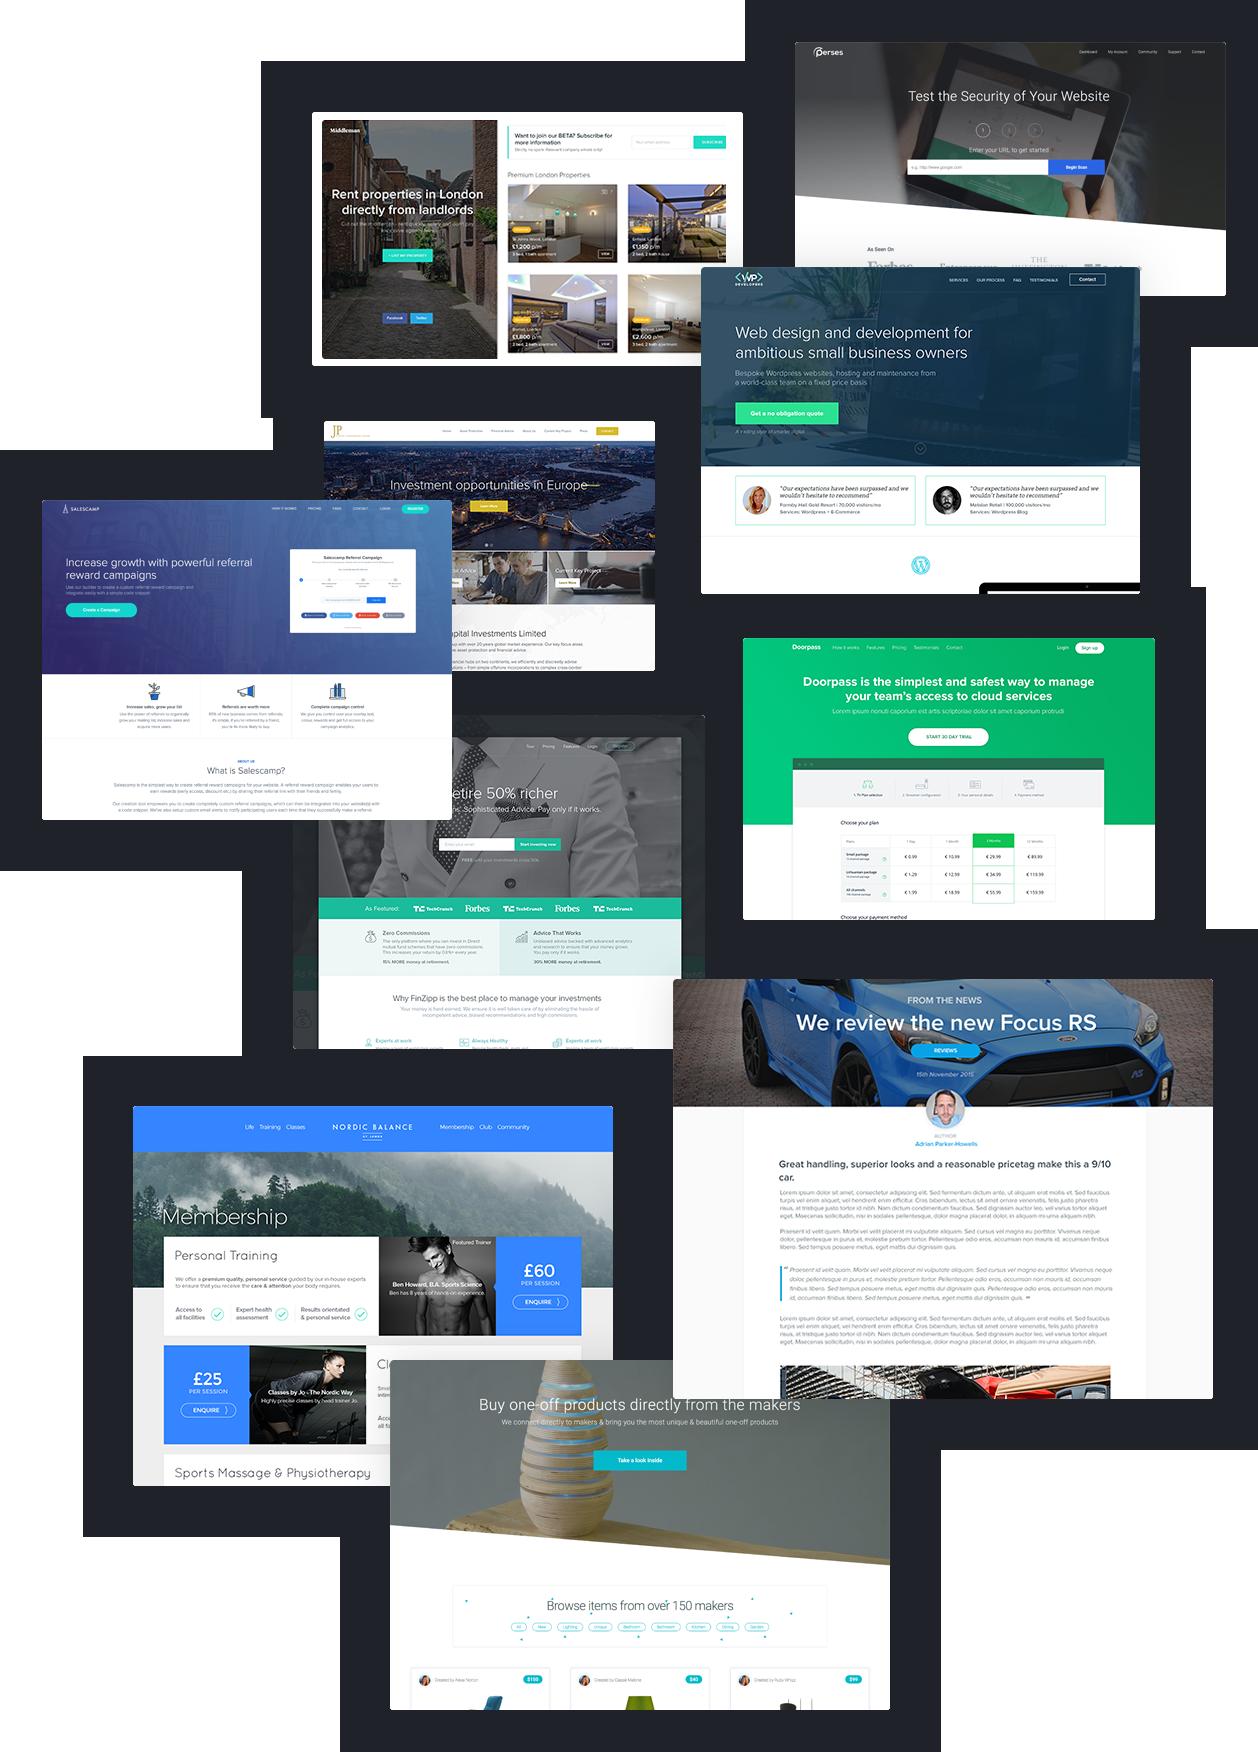 high-converting website